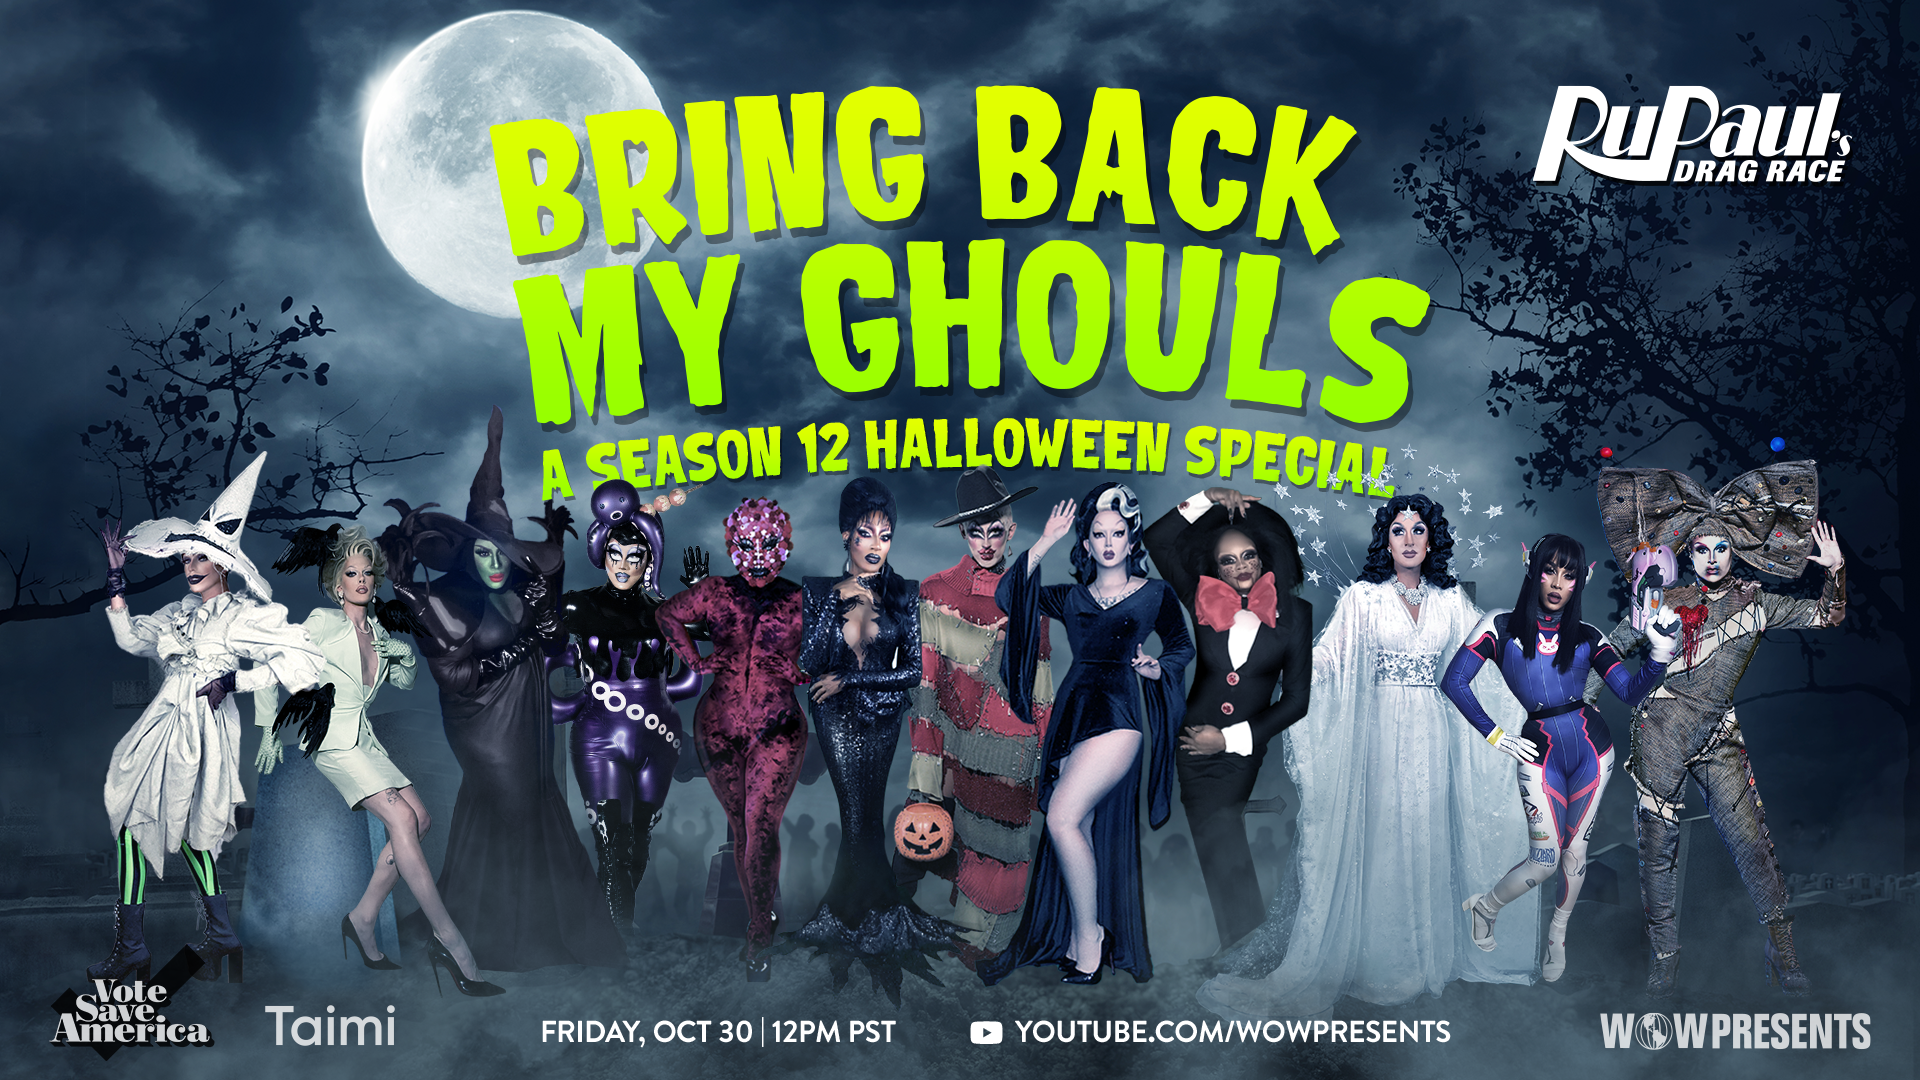 RuPaul's Drag Race Bring Back My Ghouls